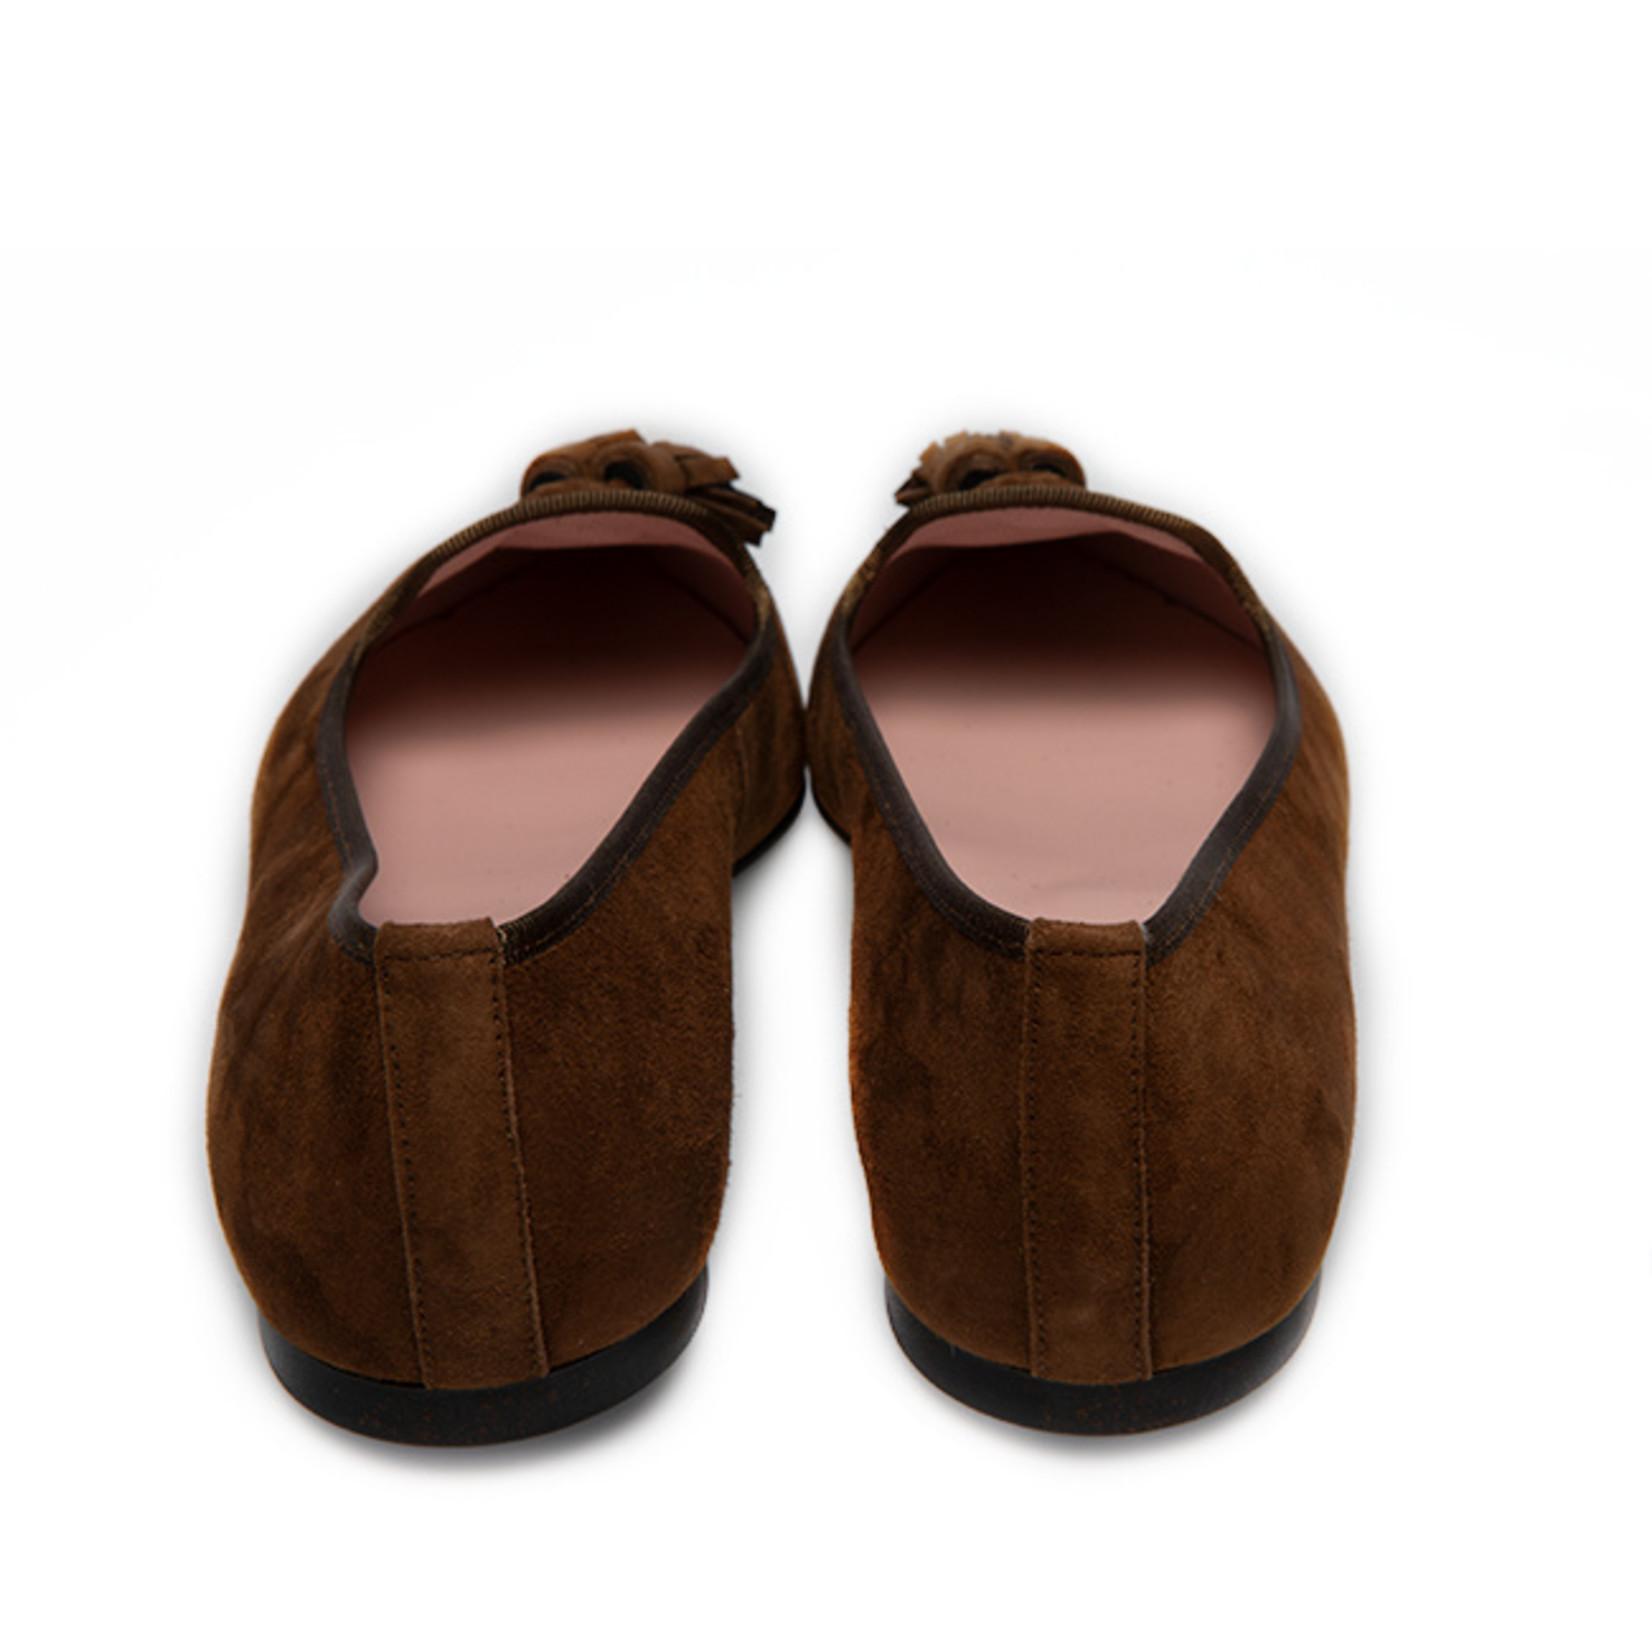 Pretty Ballerina loafer spits